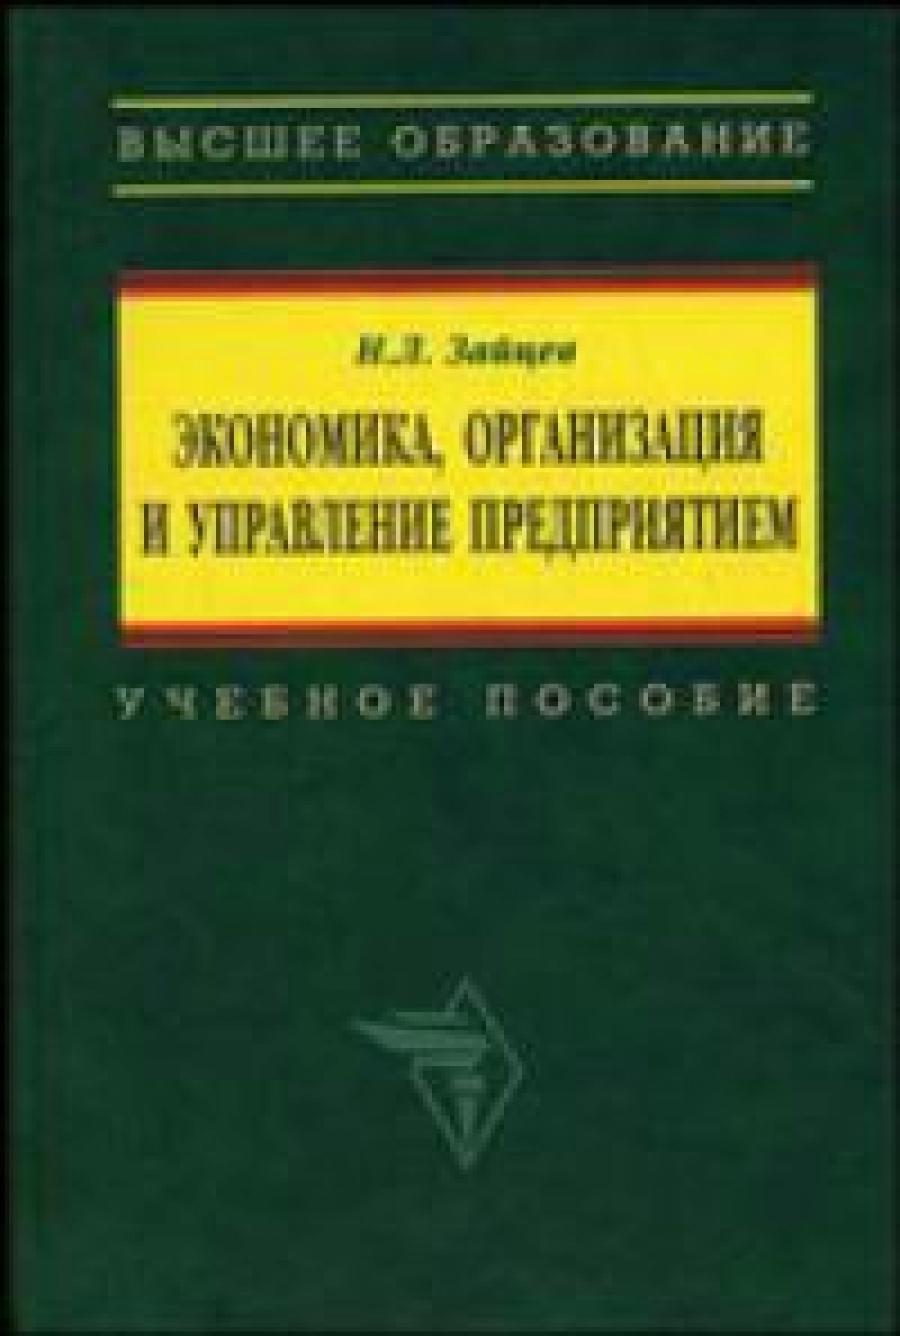 Обложка книги:  зайцев н. л. - экономика, организация и управление предприятием